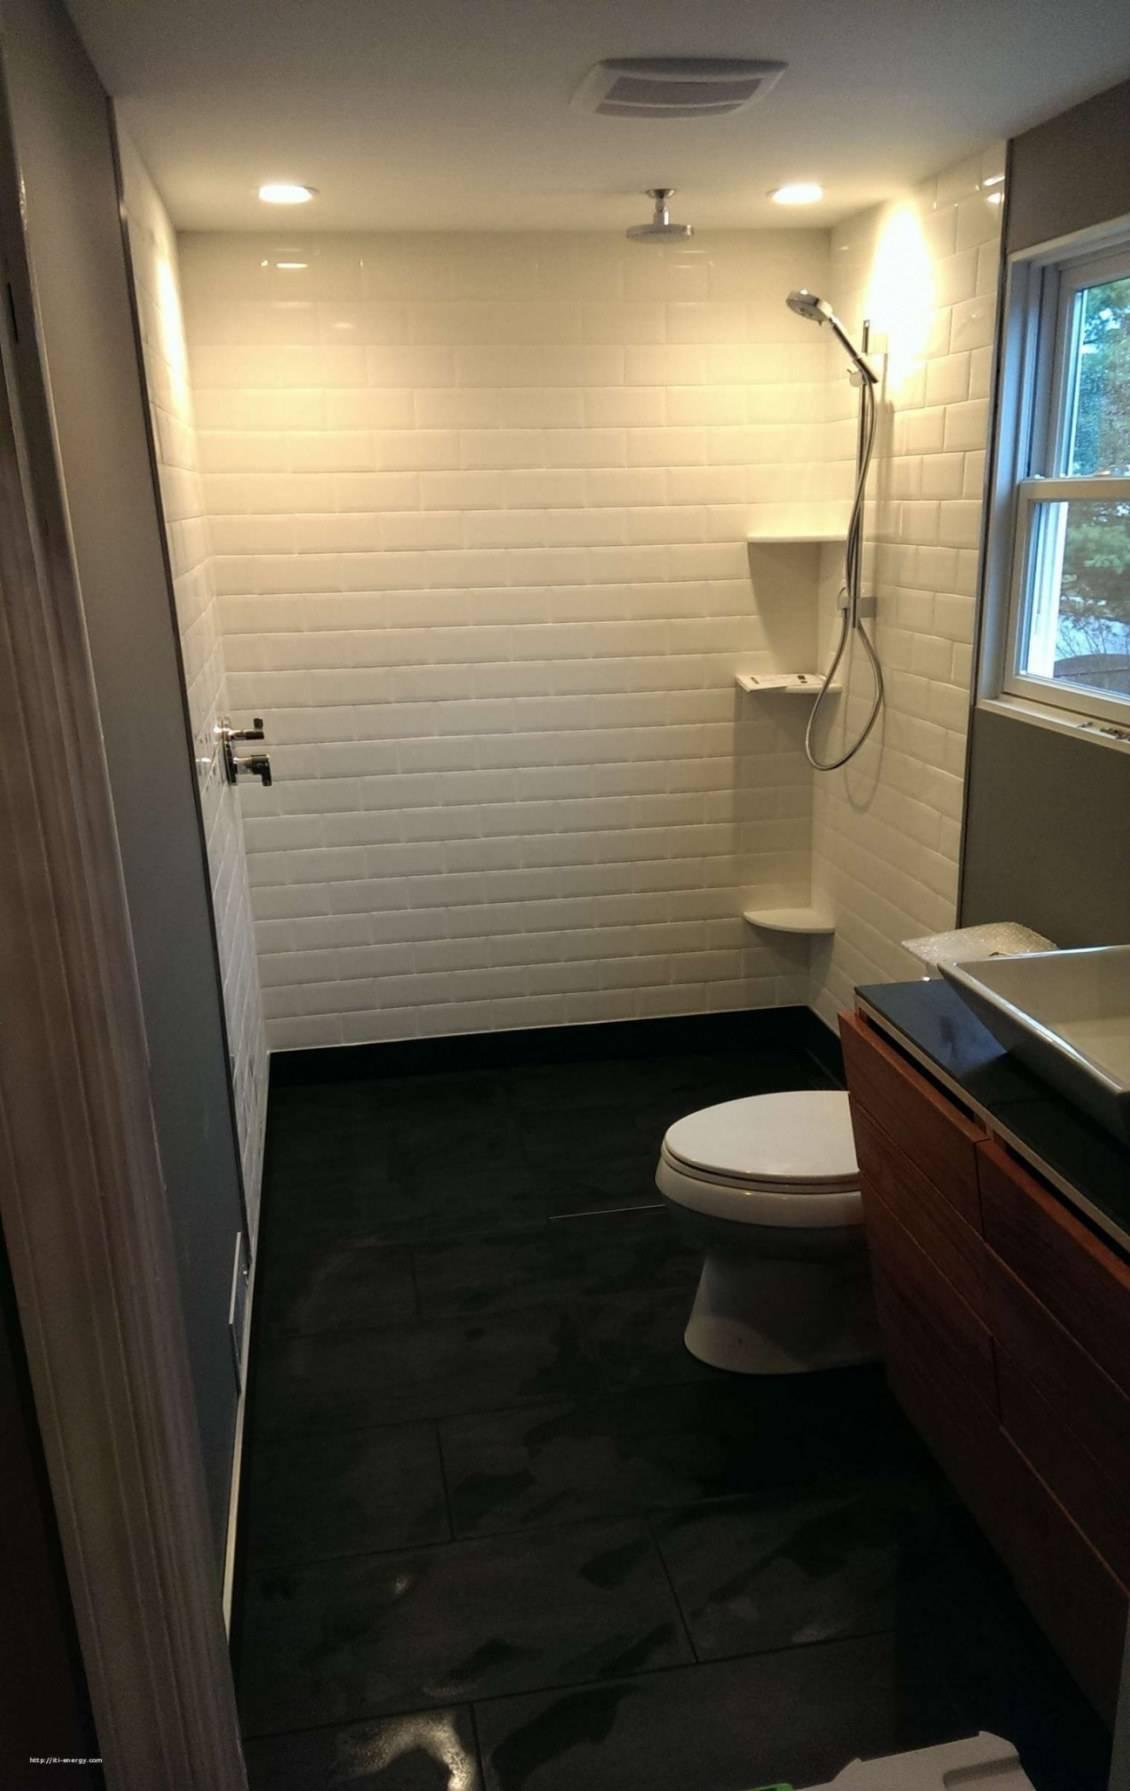 small bathroom design more than 30 luxury small master bathroom ideas of small bathroom design 1